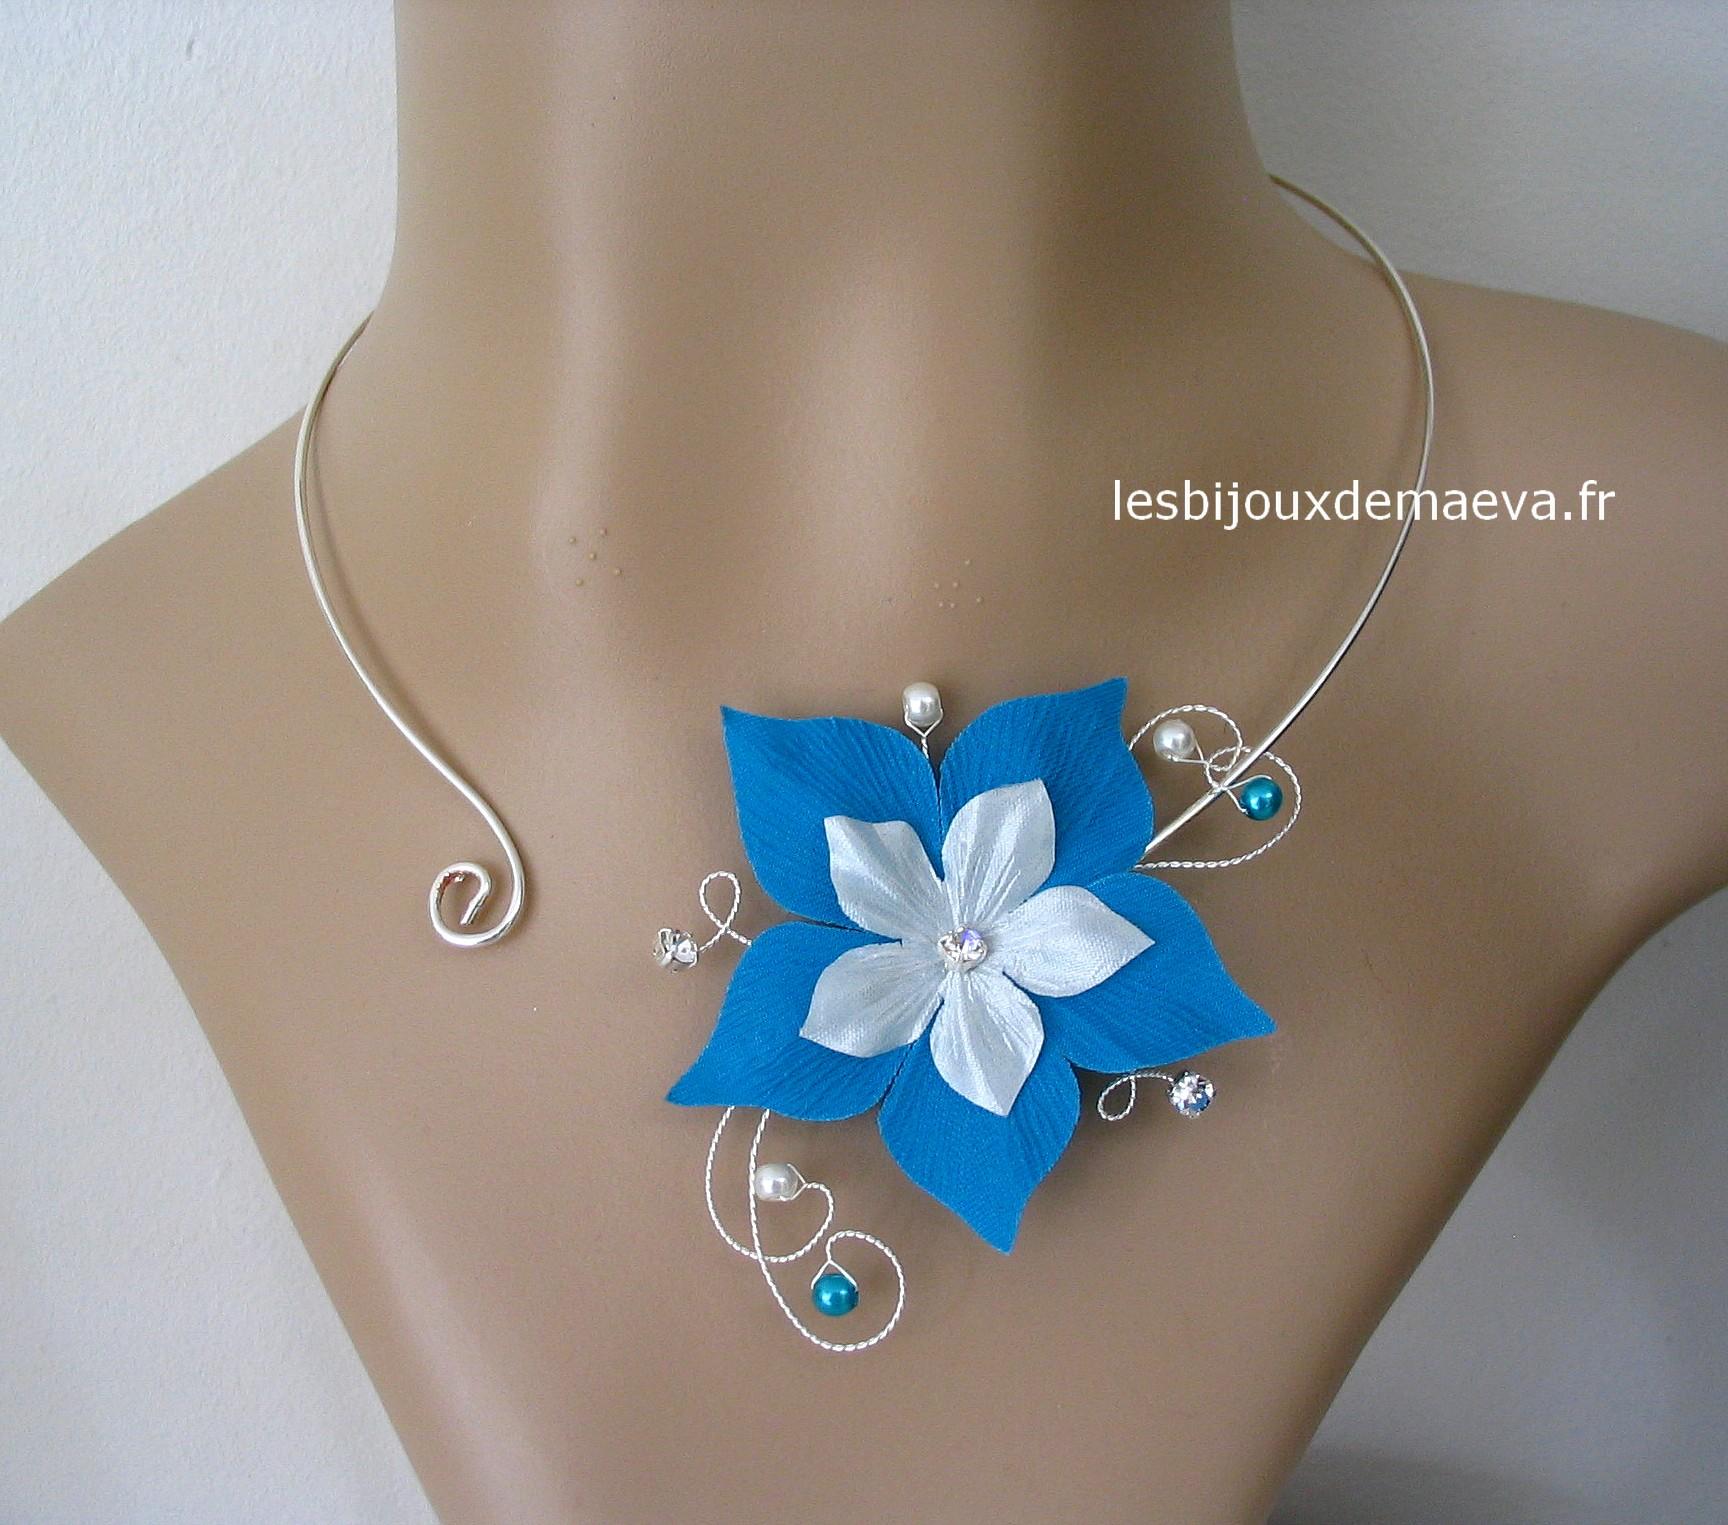 51748a1d29e17 Bijoux mariage turquoise collier ouvert Duo